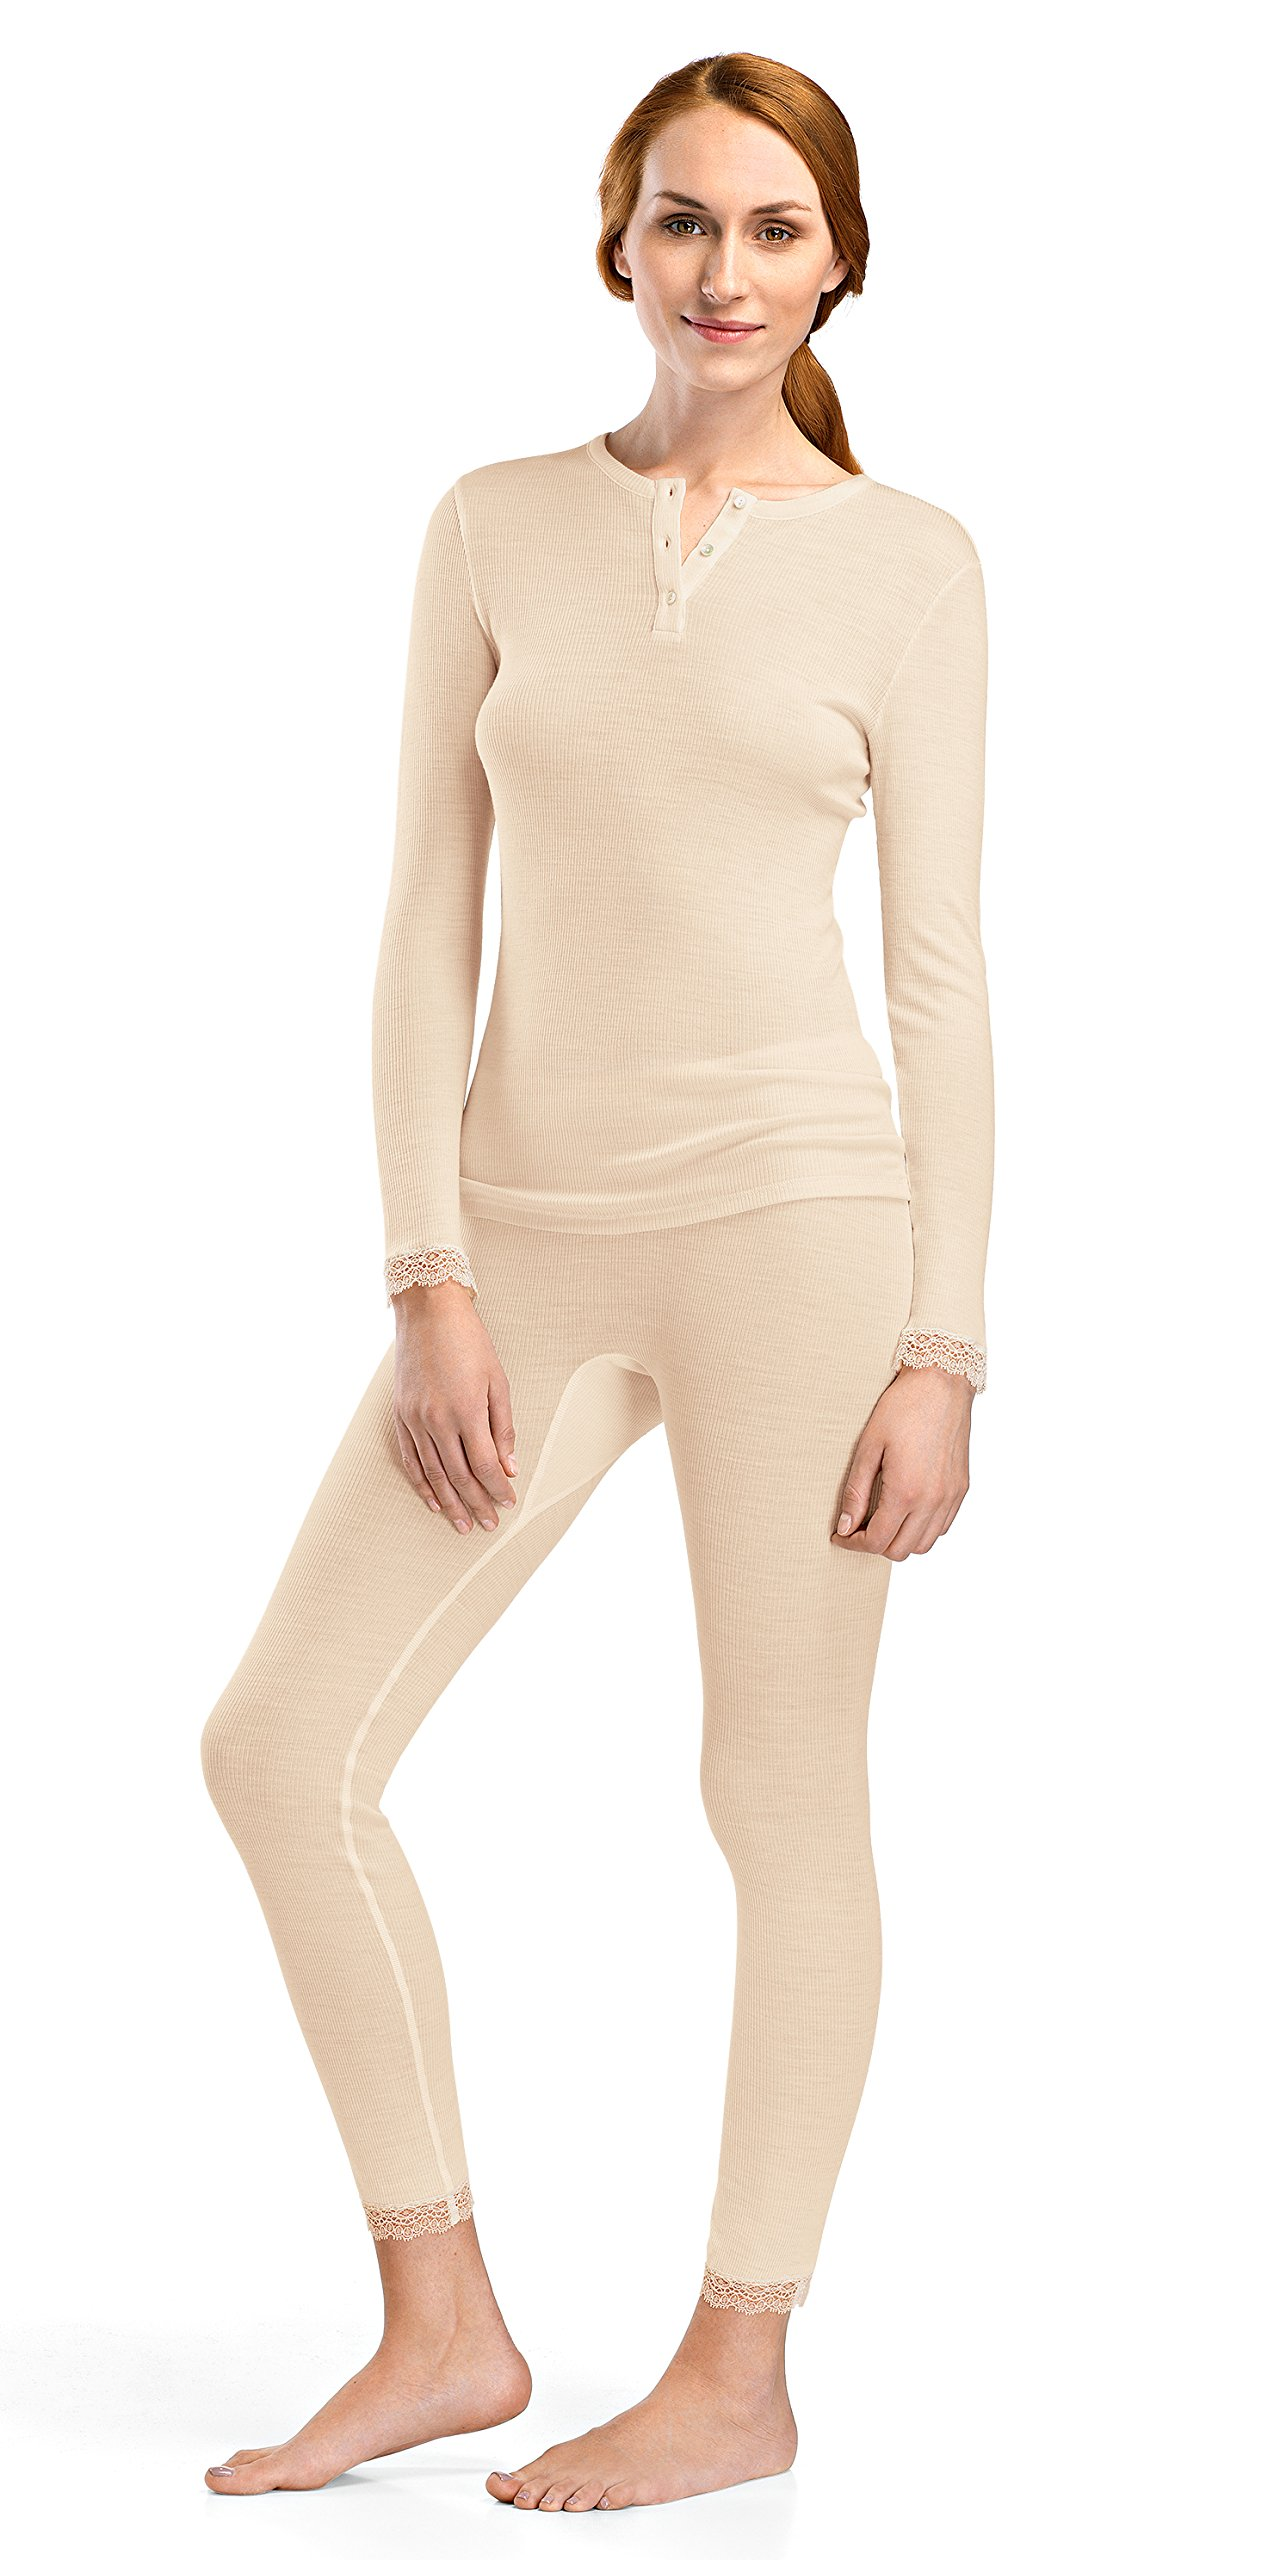 Hanro Women's Woolen Lace Long Sleeve Henley Shirt, Vanilla, Small